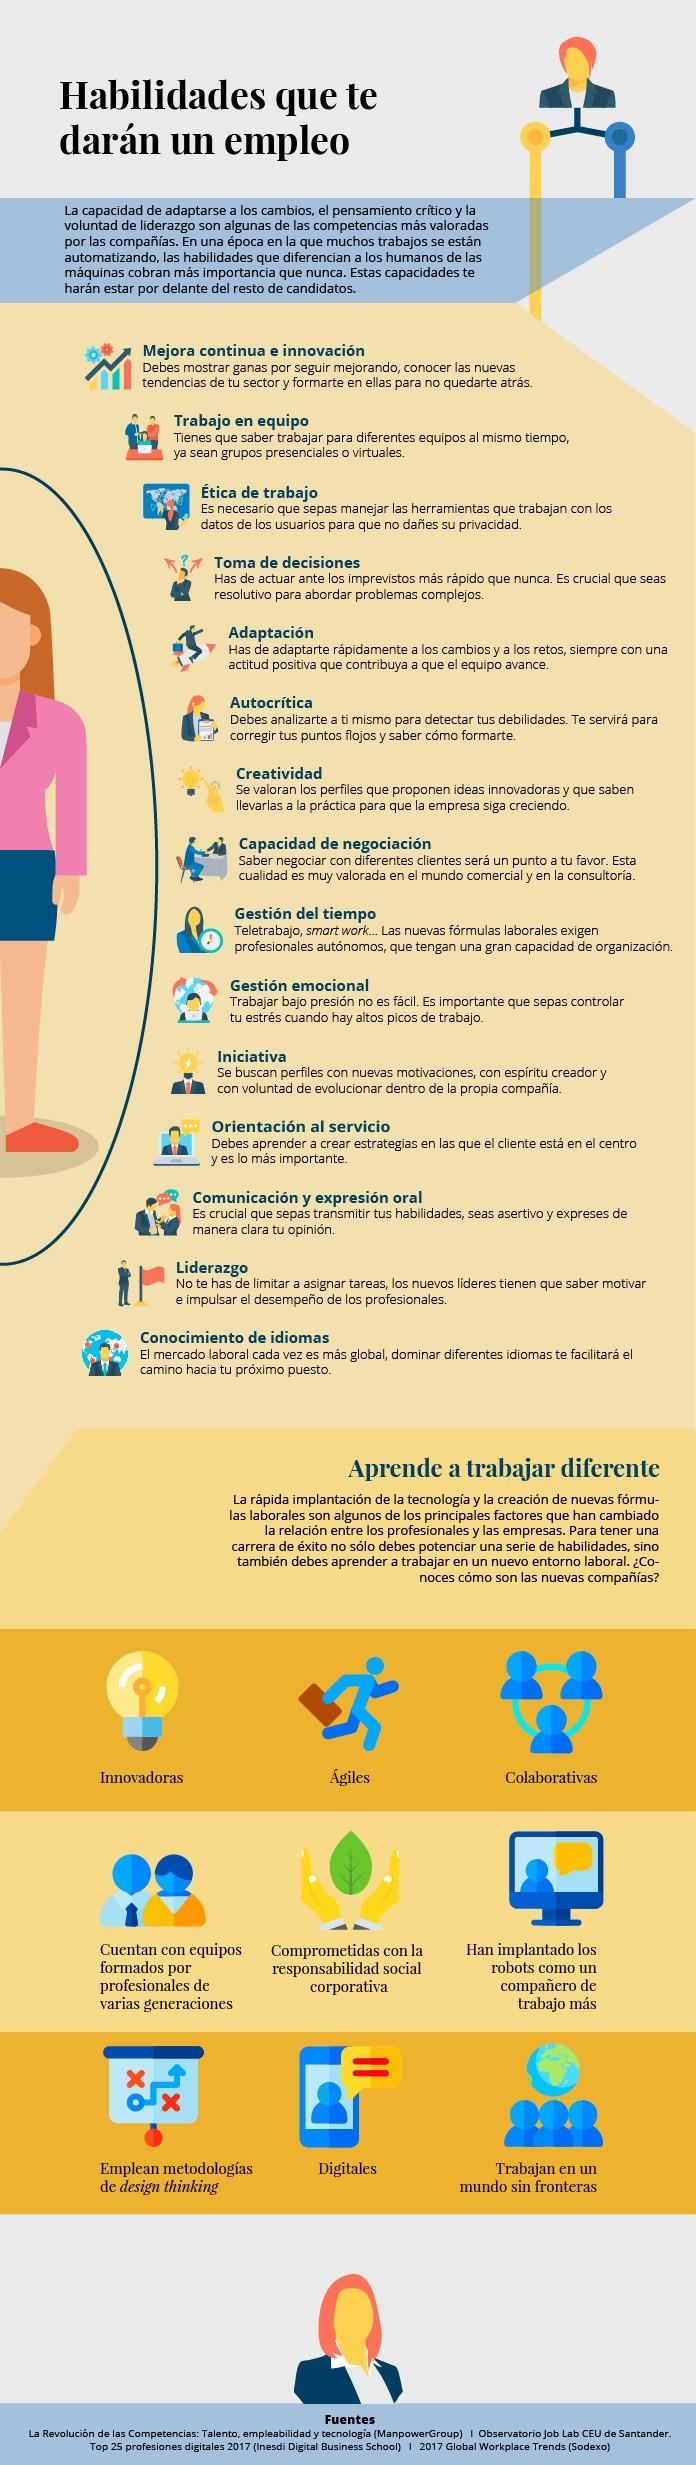 habilidades-empleo2.jpg